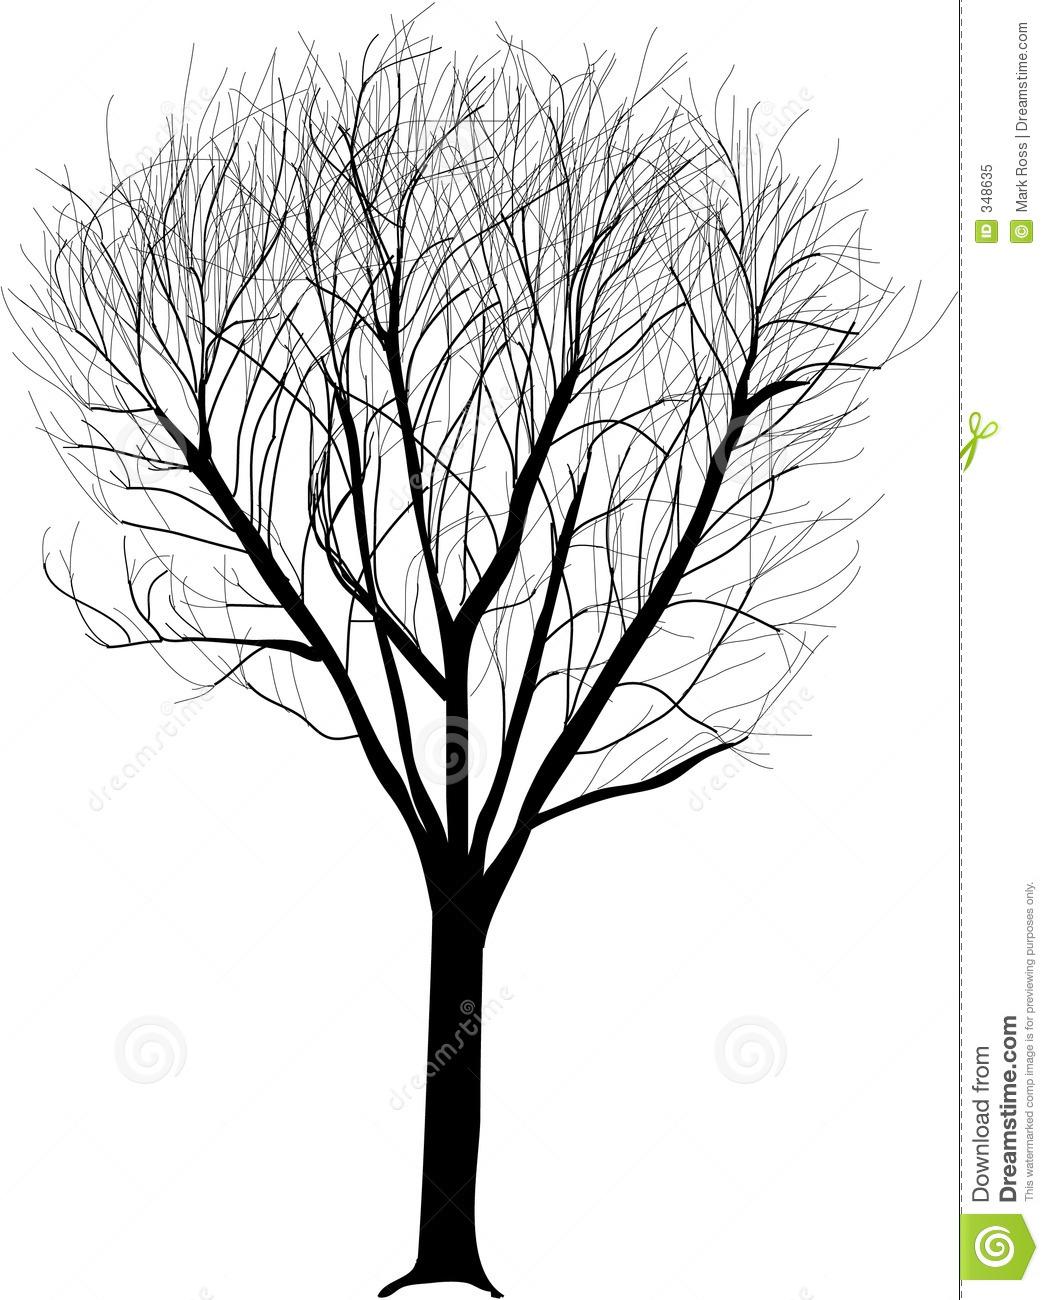 Lone Tree Illustration Royalty Free Stock Photo.